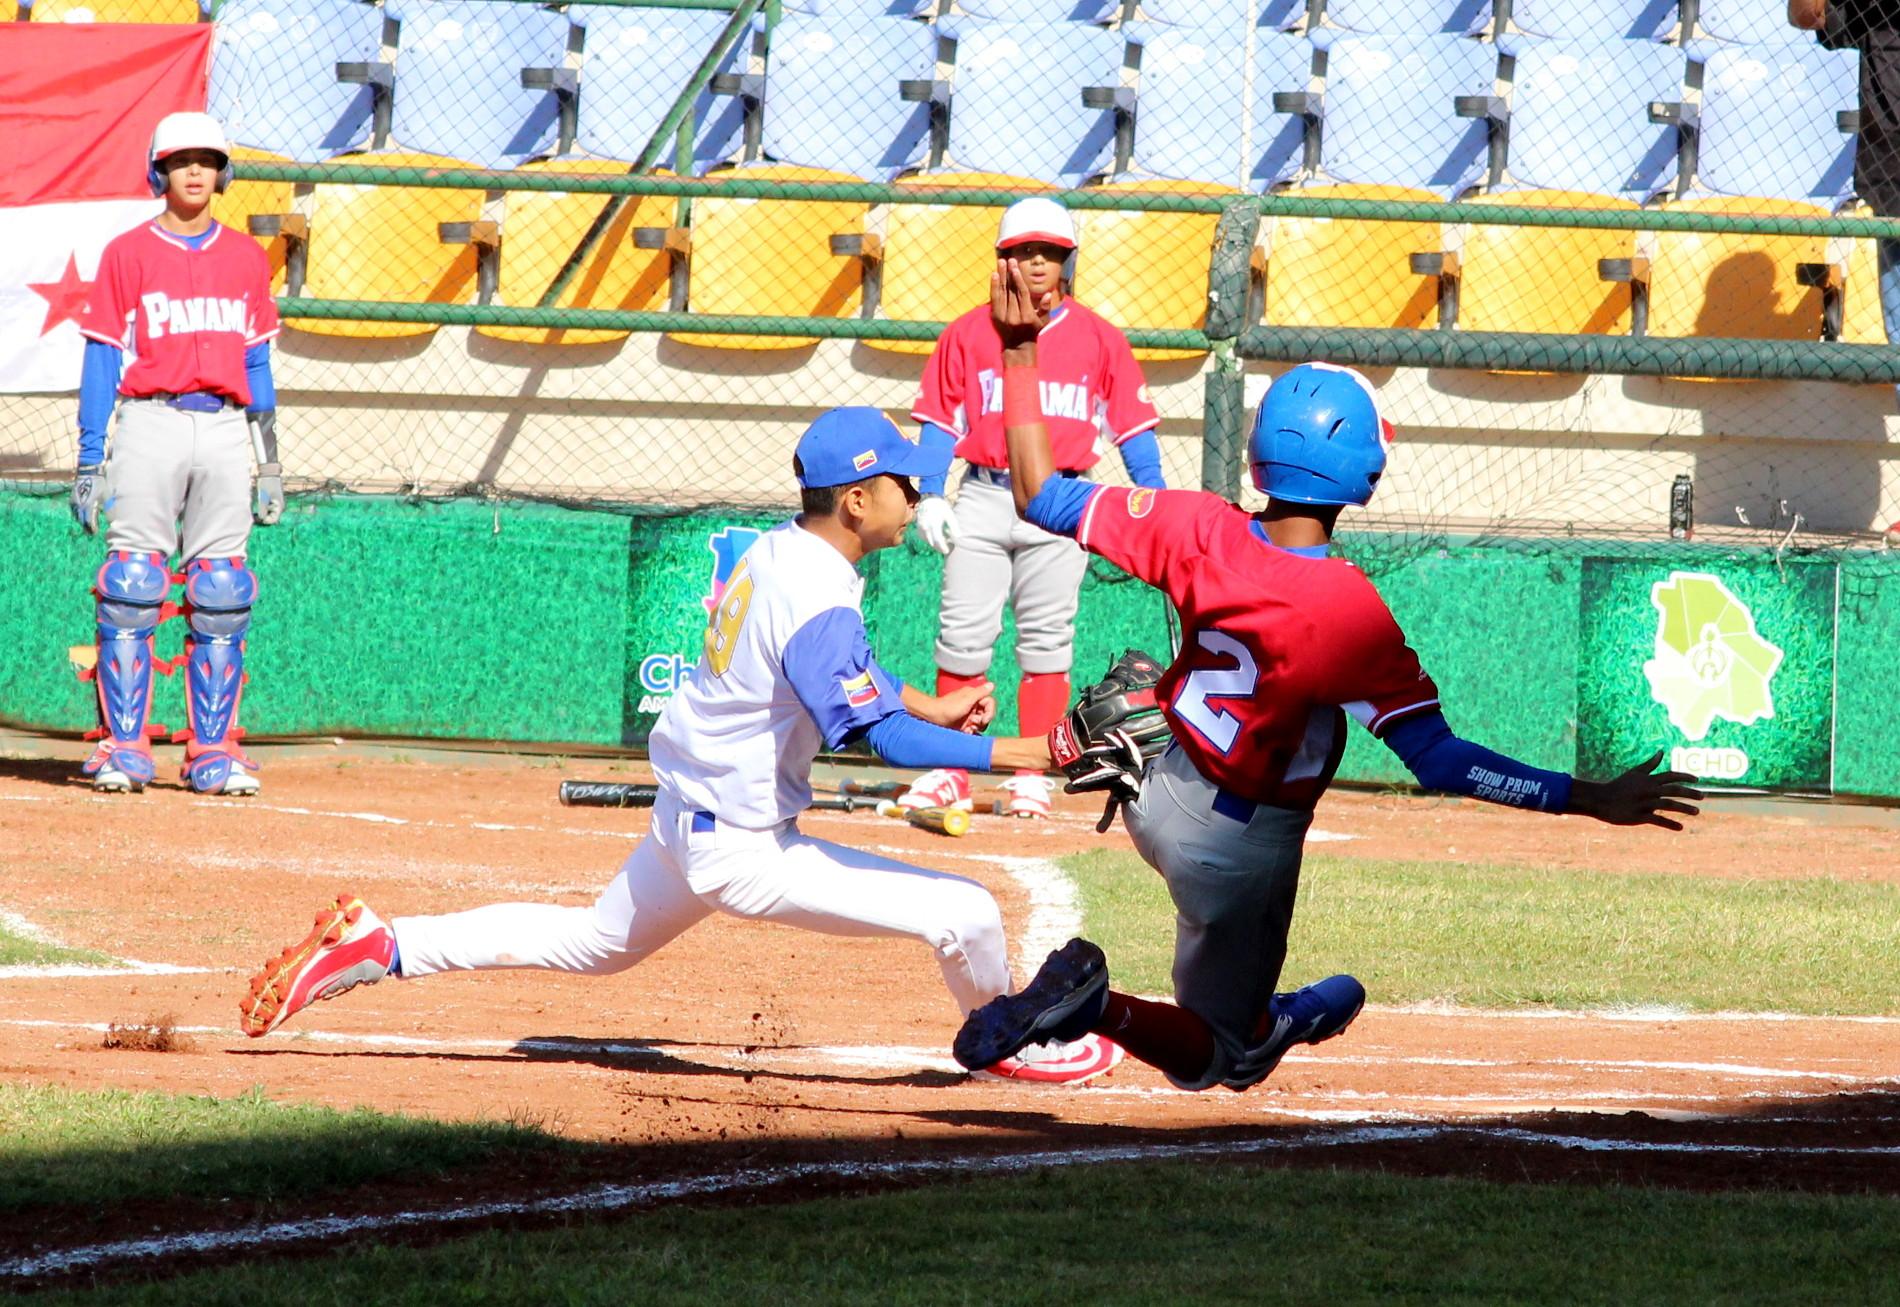 Panamá derrotó a Argentina 35 carreras a 0 en Panamericano Sub-14